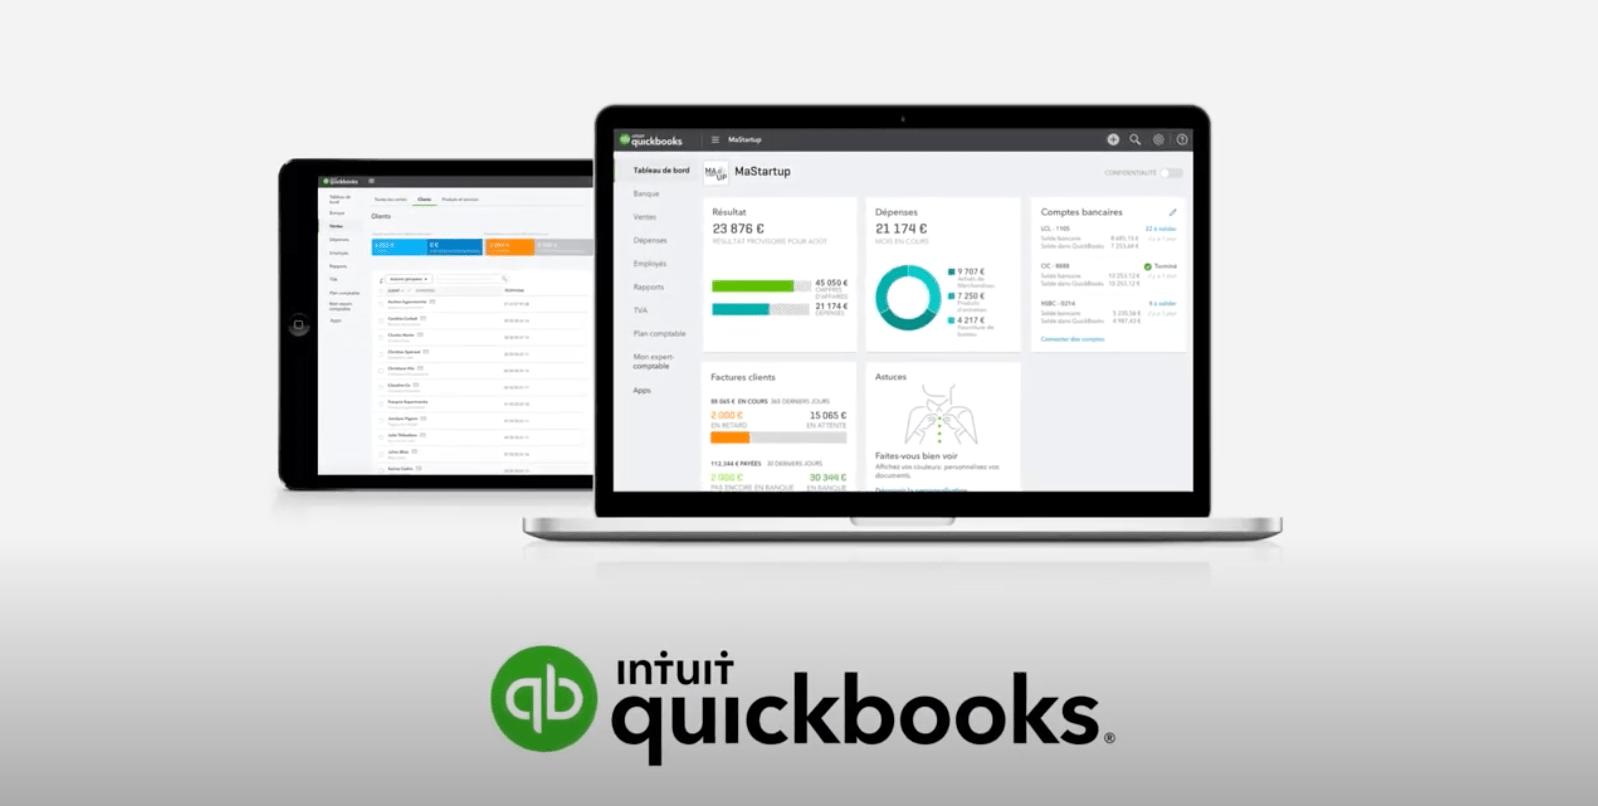 Quickbooks logiciel